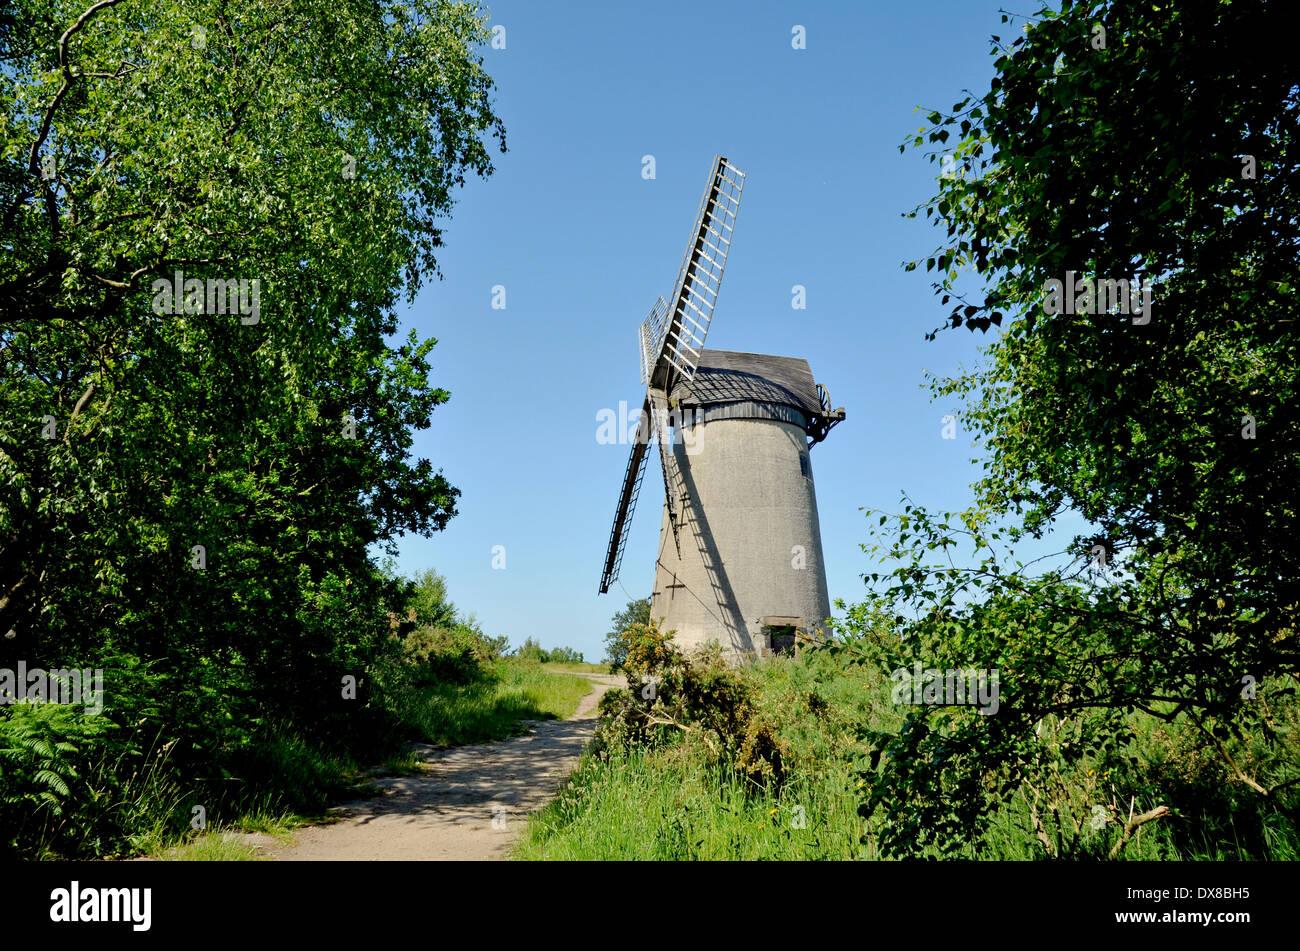 The windmill on Bidston Hill, Birkenhead, Wirral, UK - Stock Image